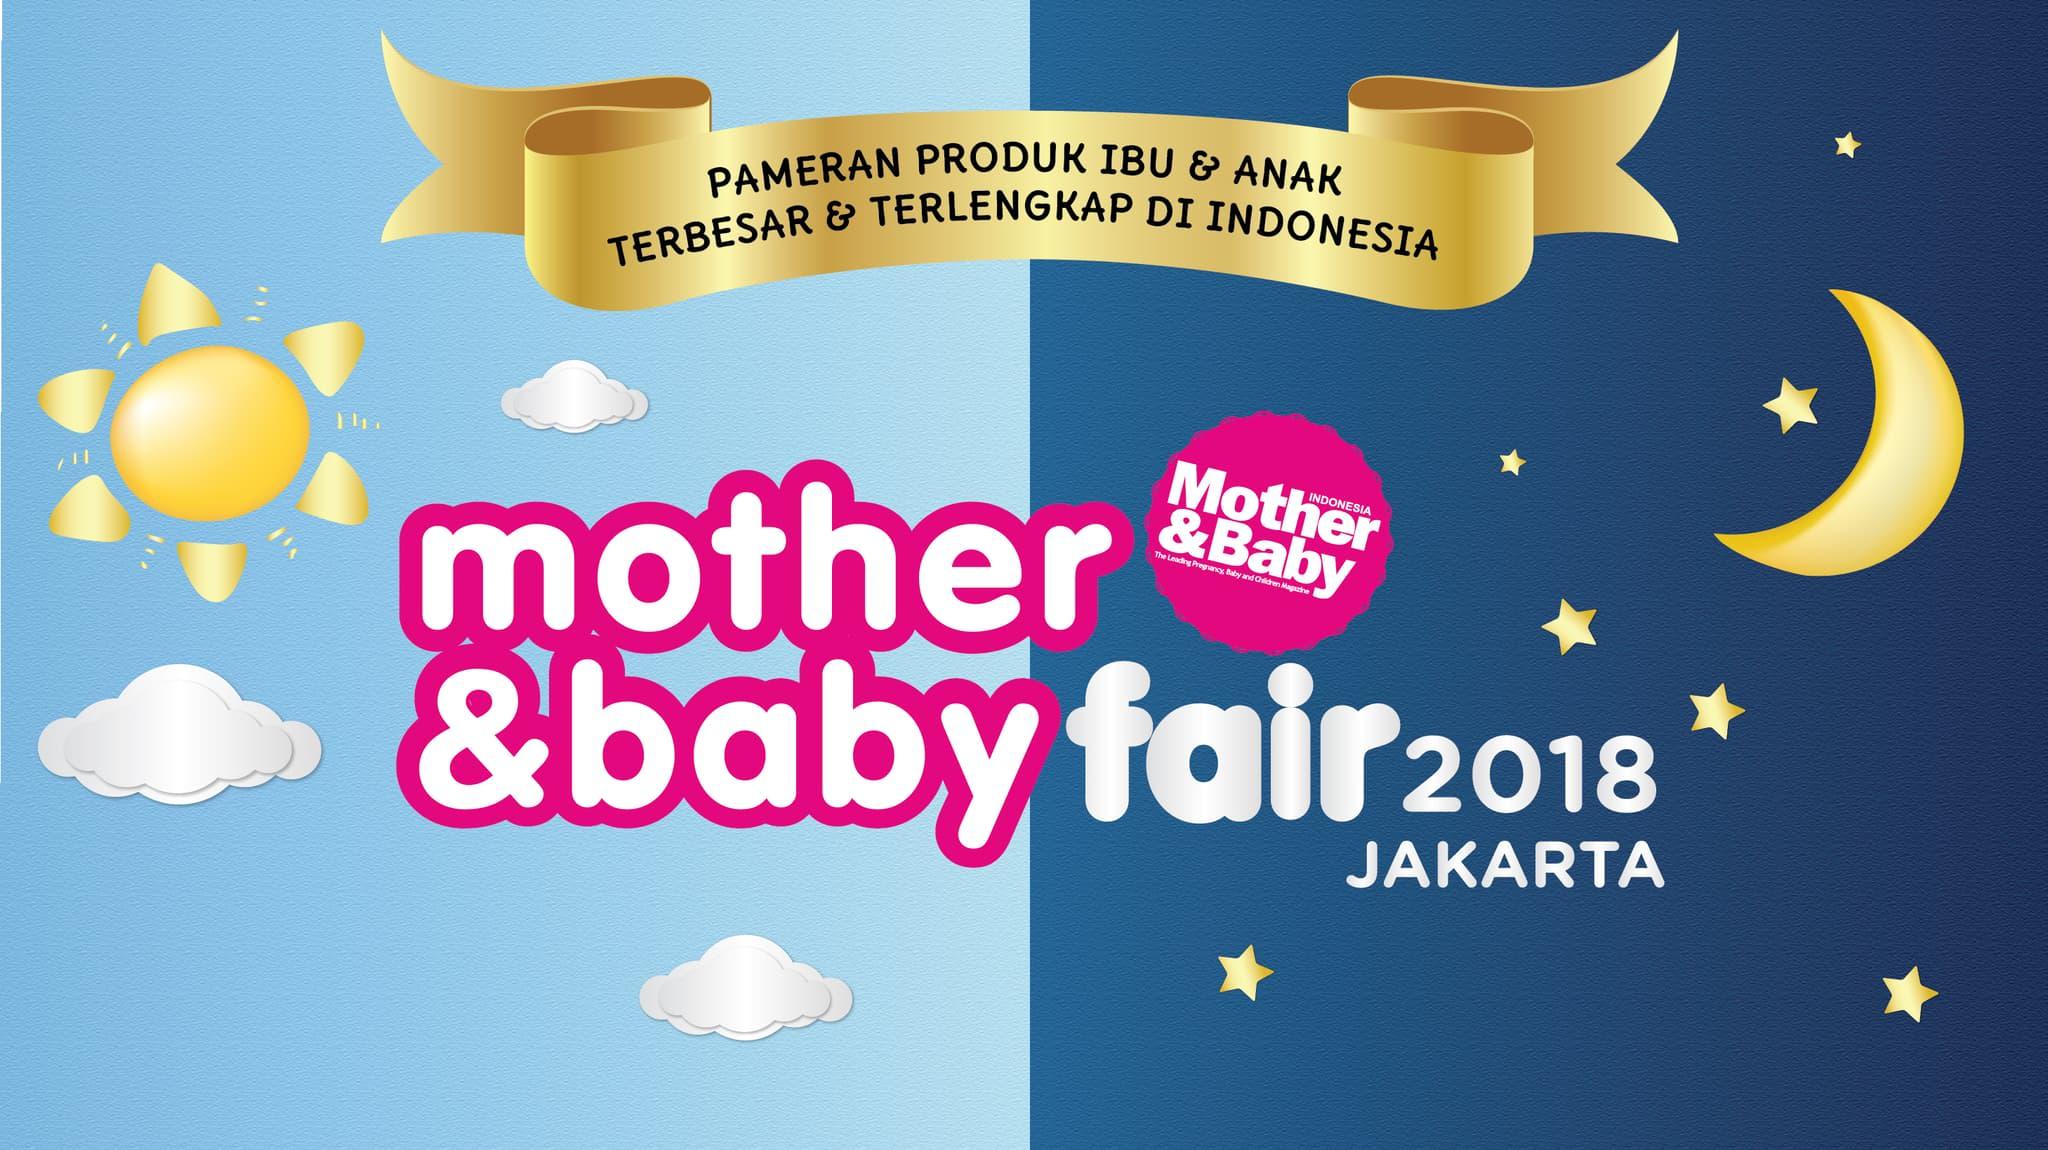 mother baby fair 2018 jual tiket mother baby fair. Black Bedroom Furniture Sets. Home Design Ideas